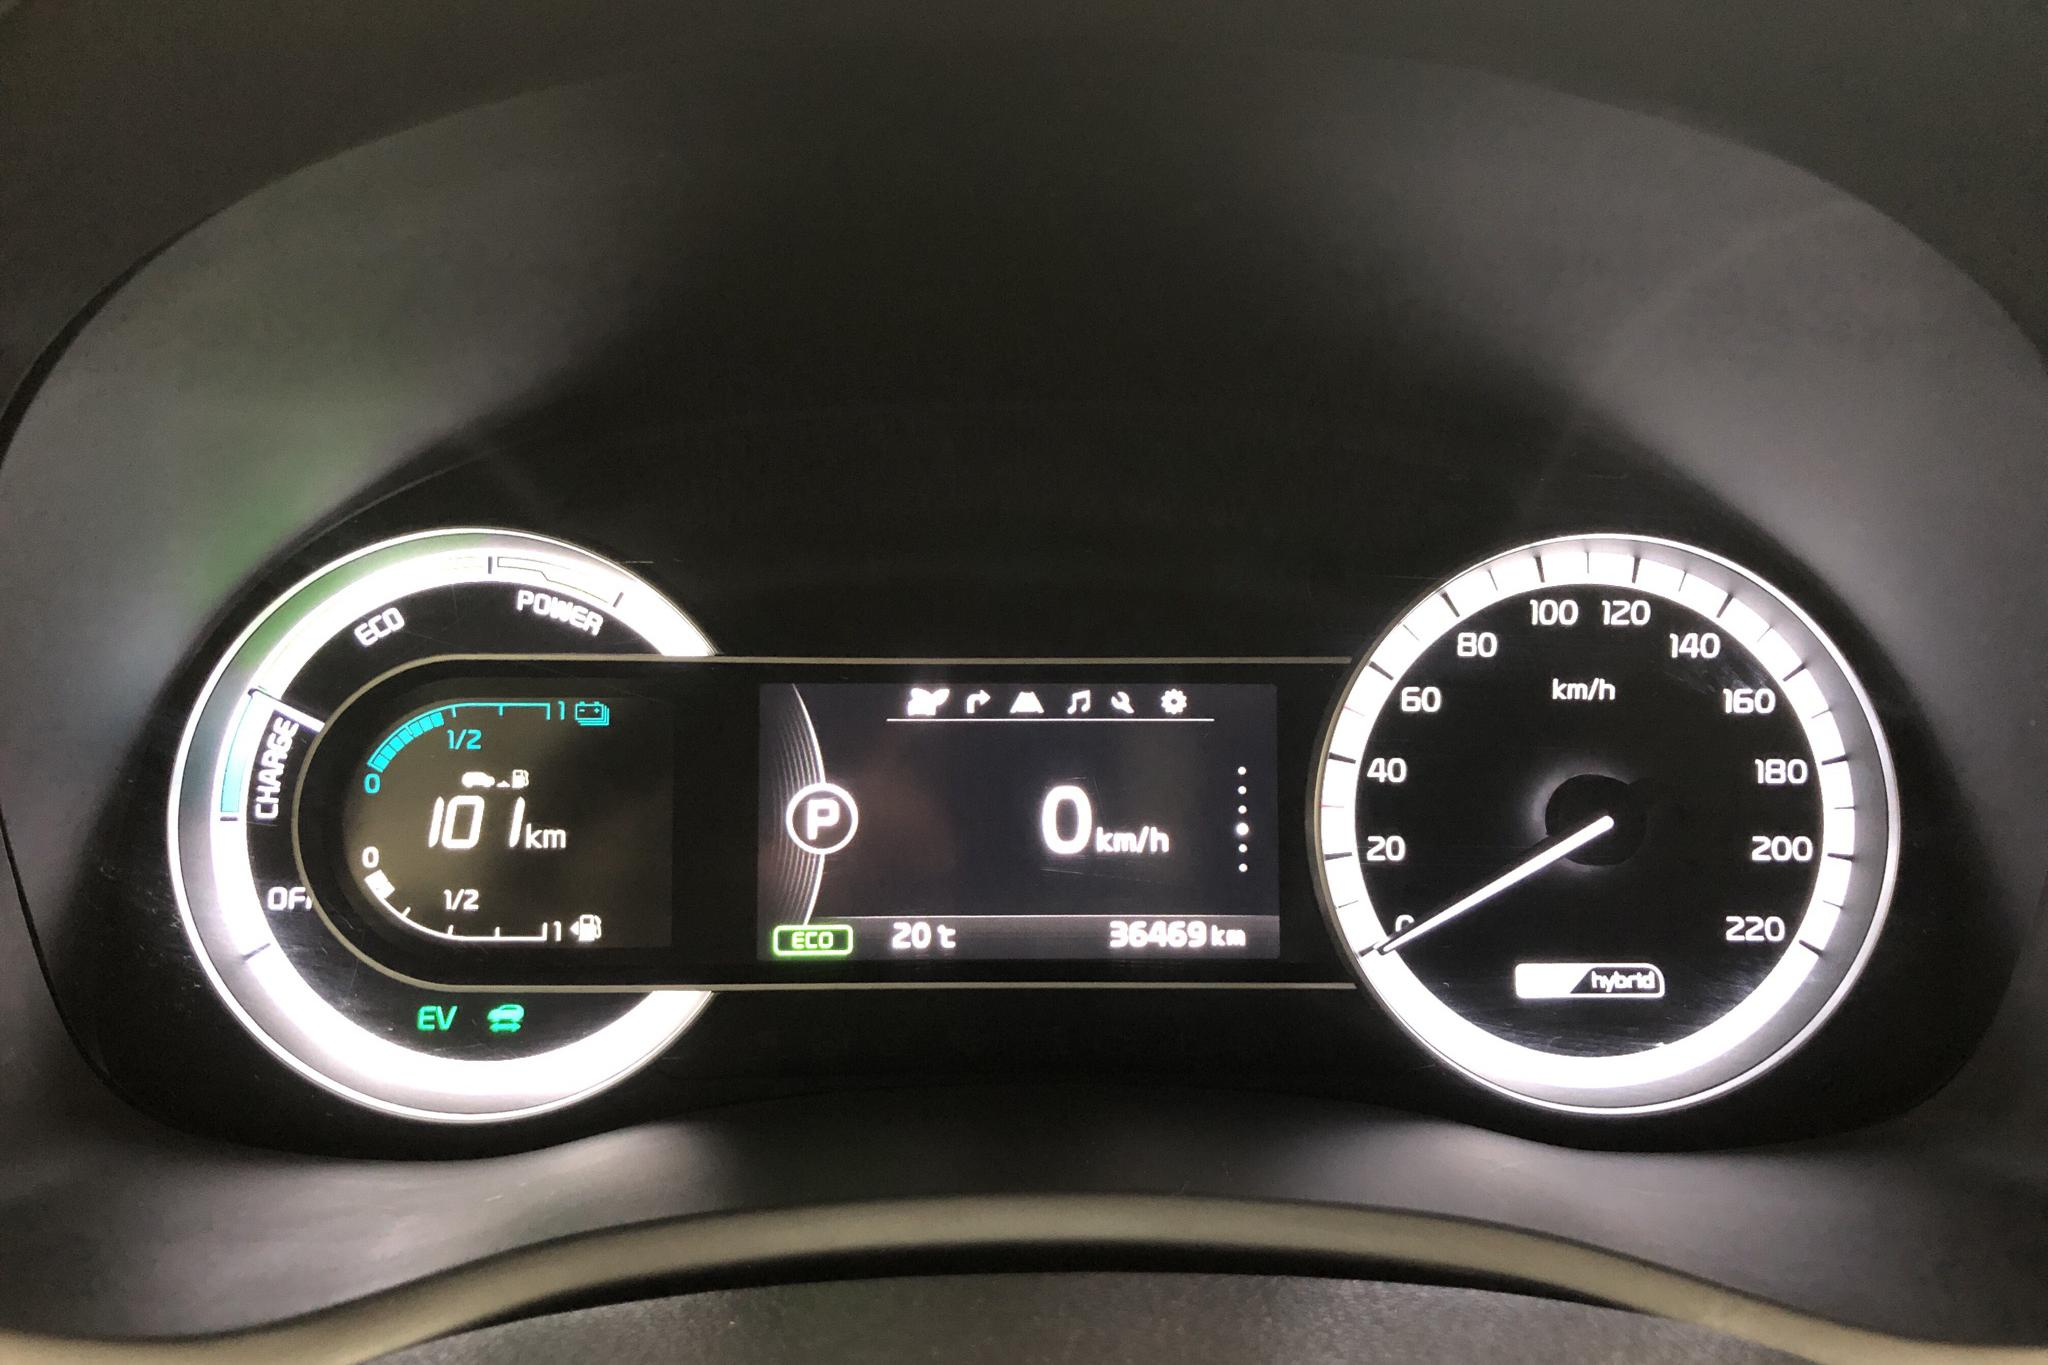 KIA Niro Hybrid 1.6 (141hk) - 3 647 mil - Automat - vit - 2019